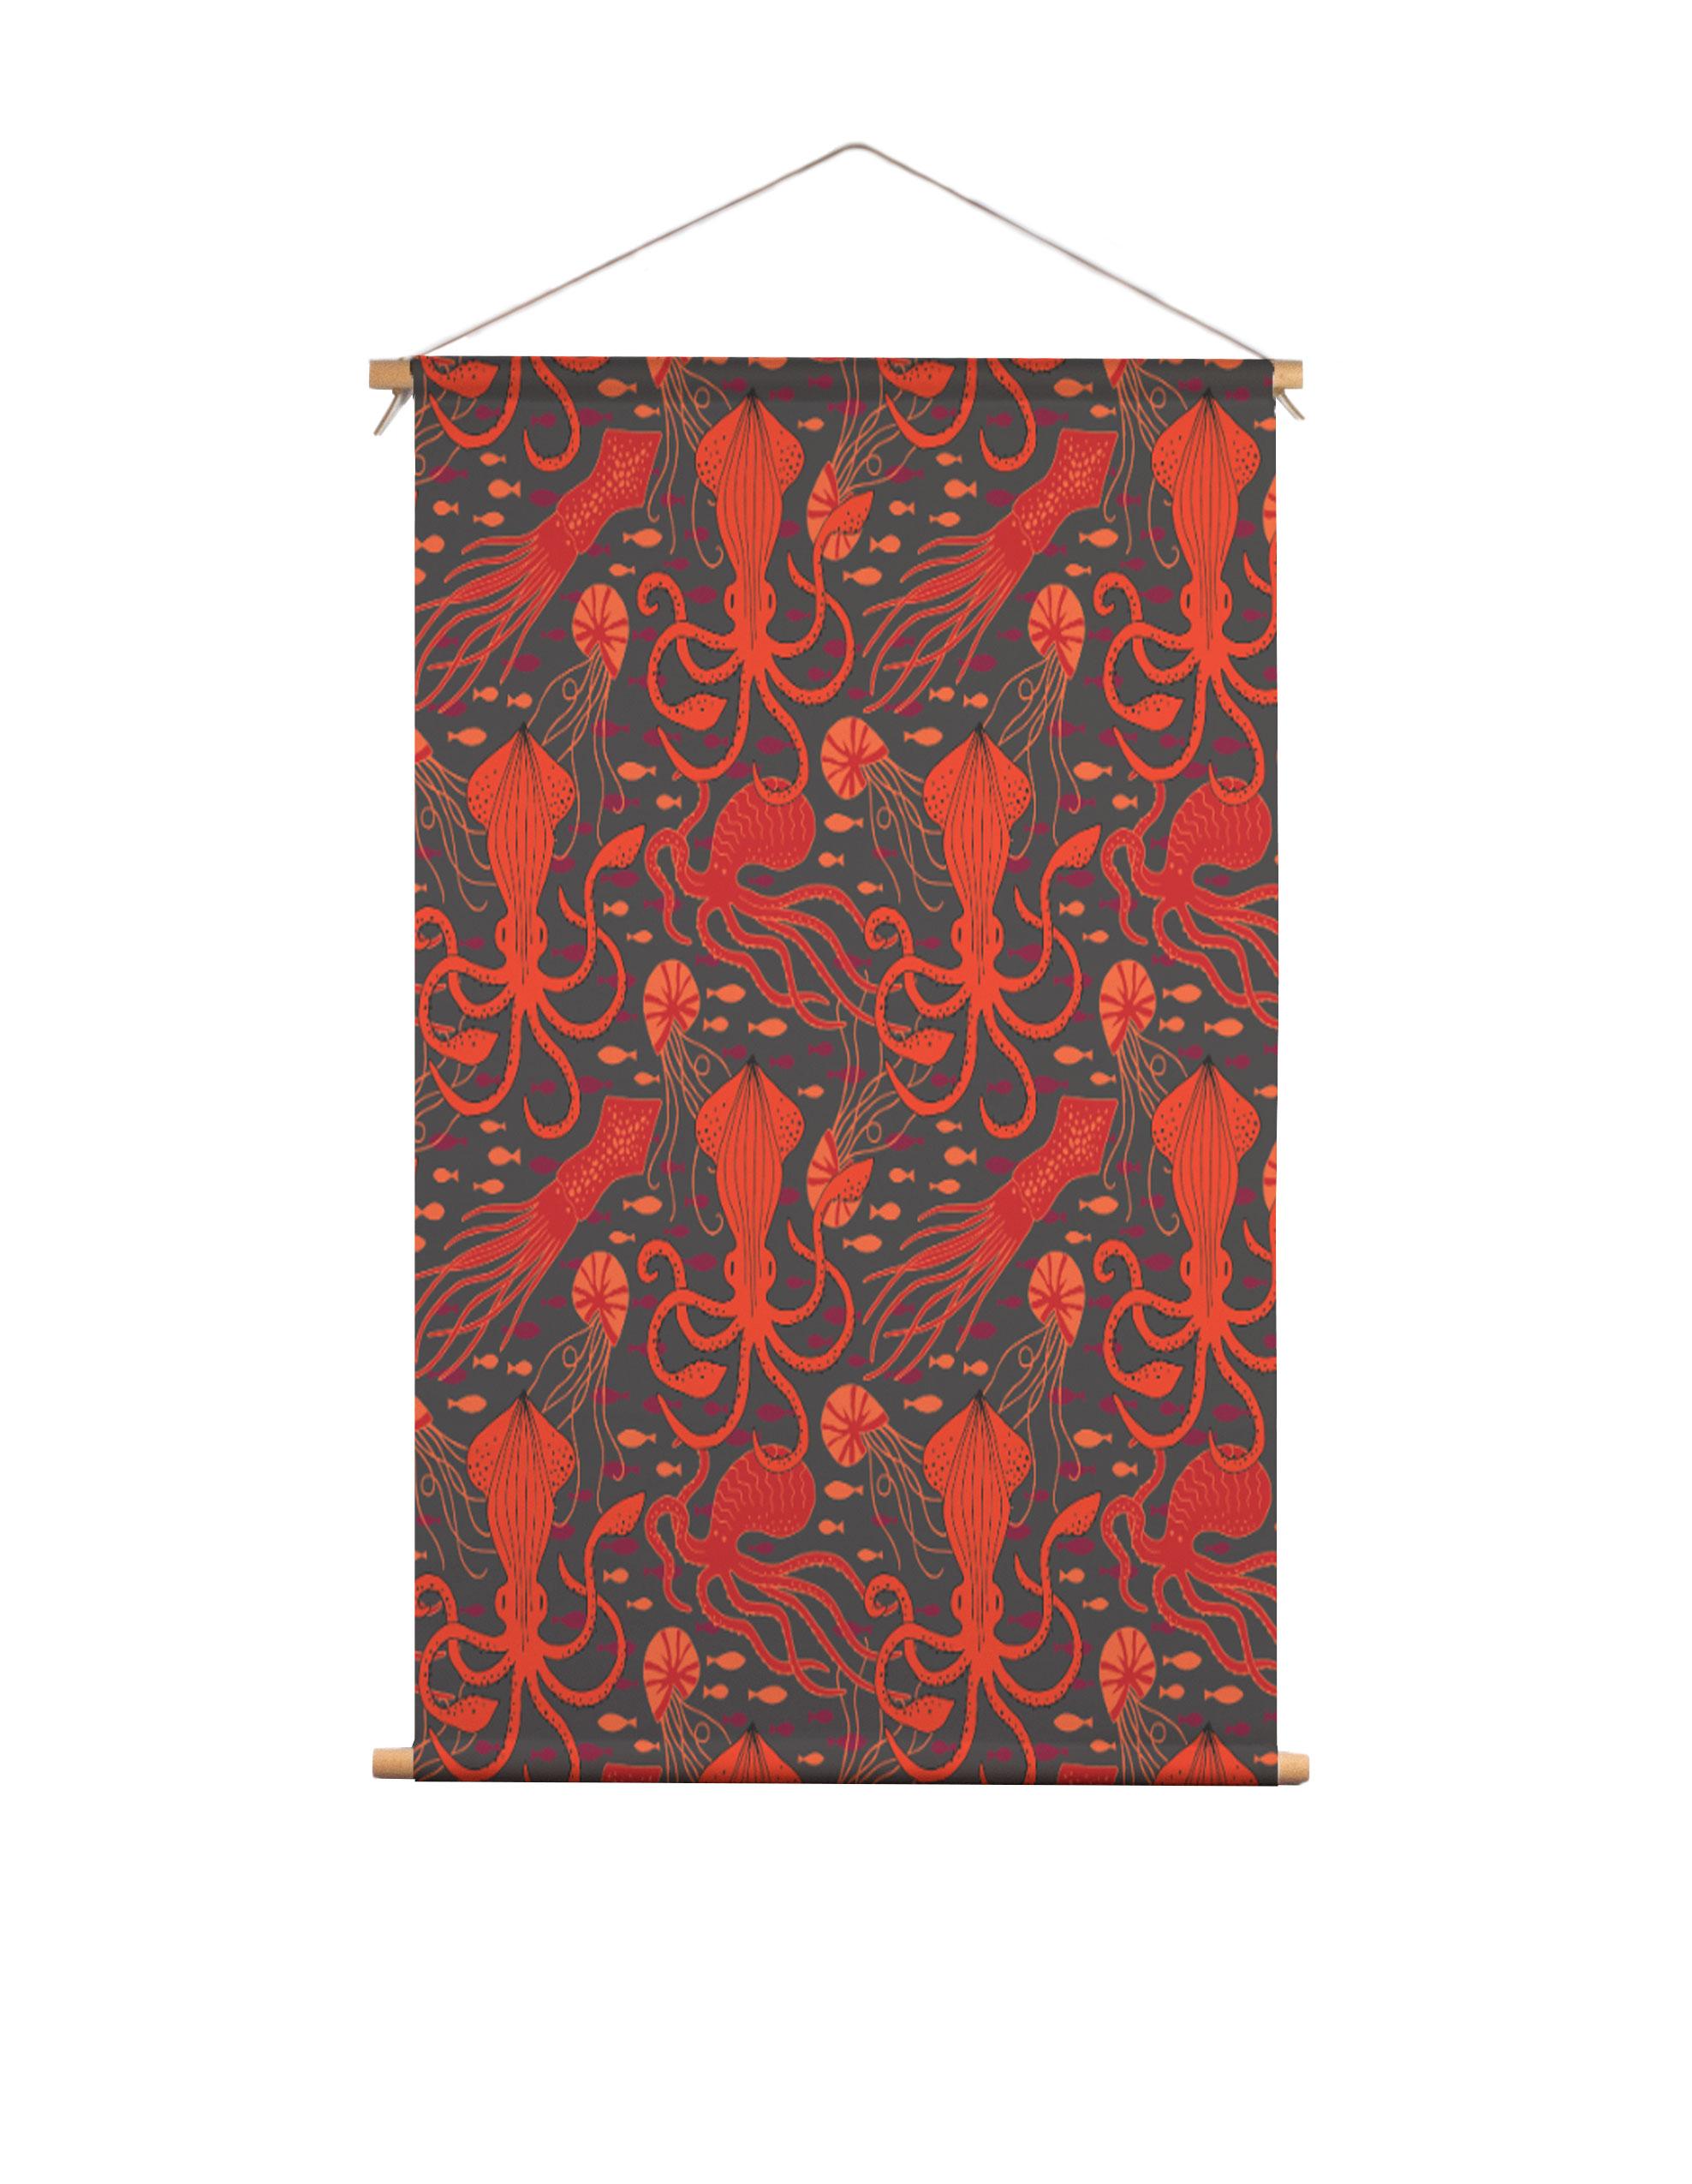 Textielposter-inktvis-HvdT-Designs